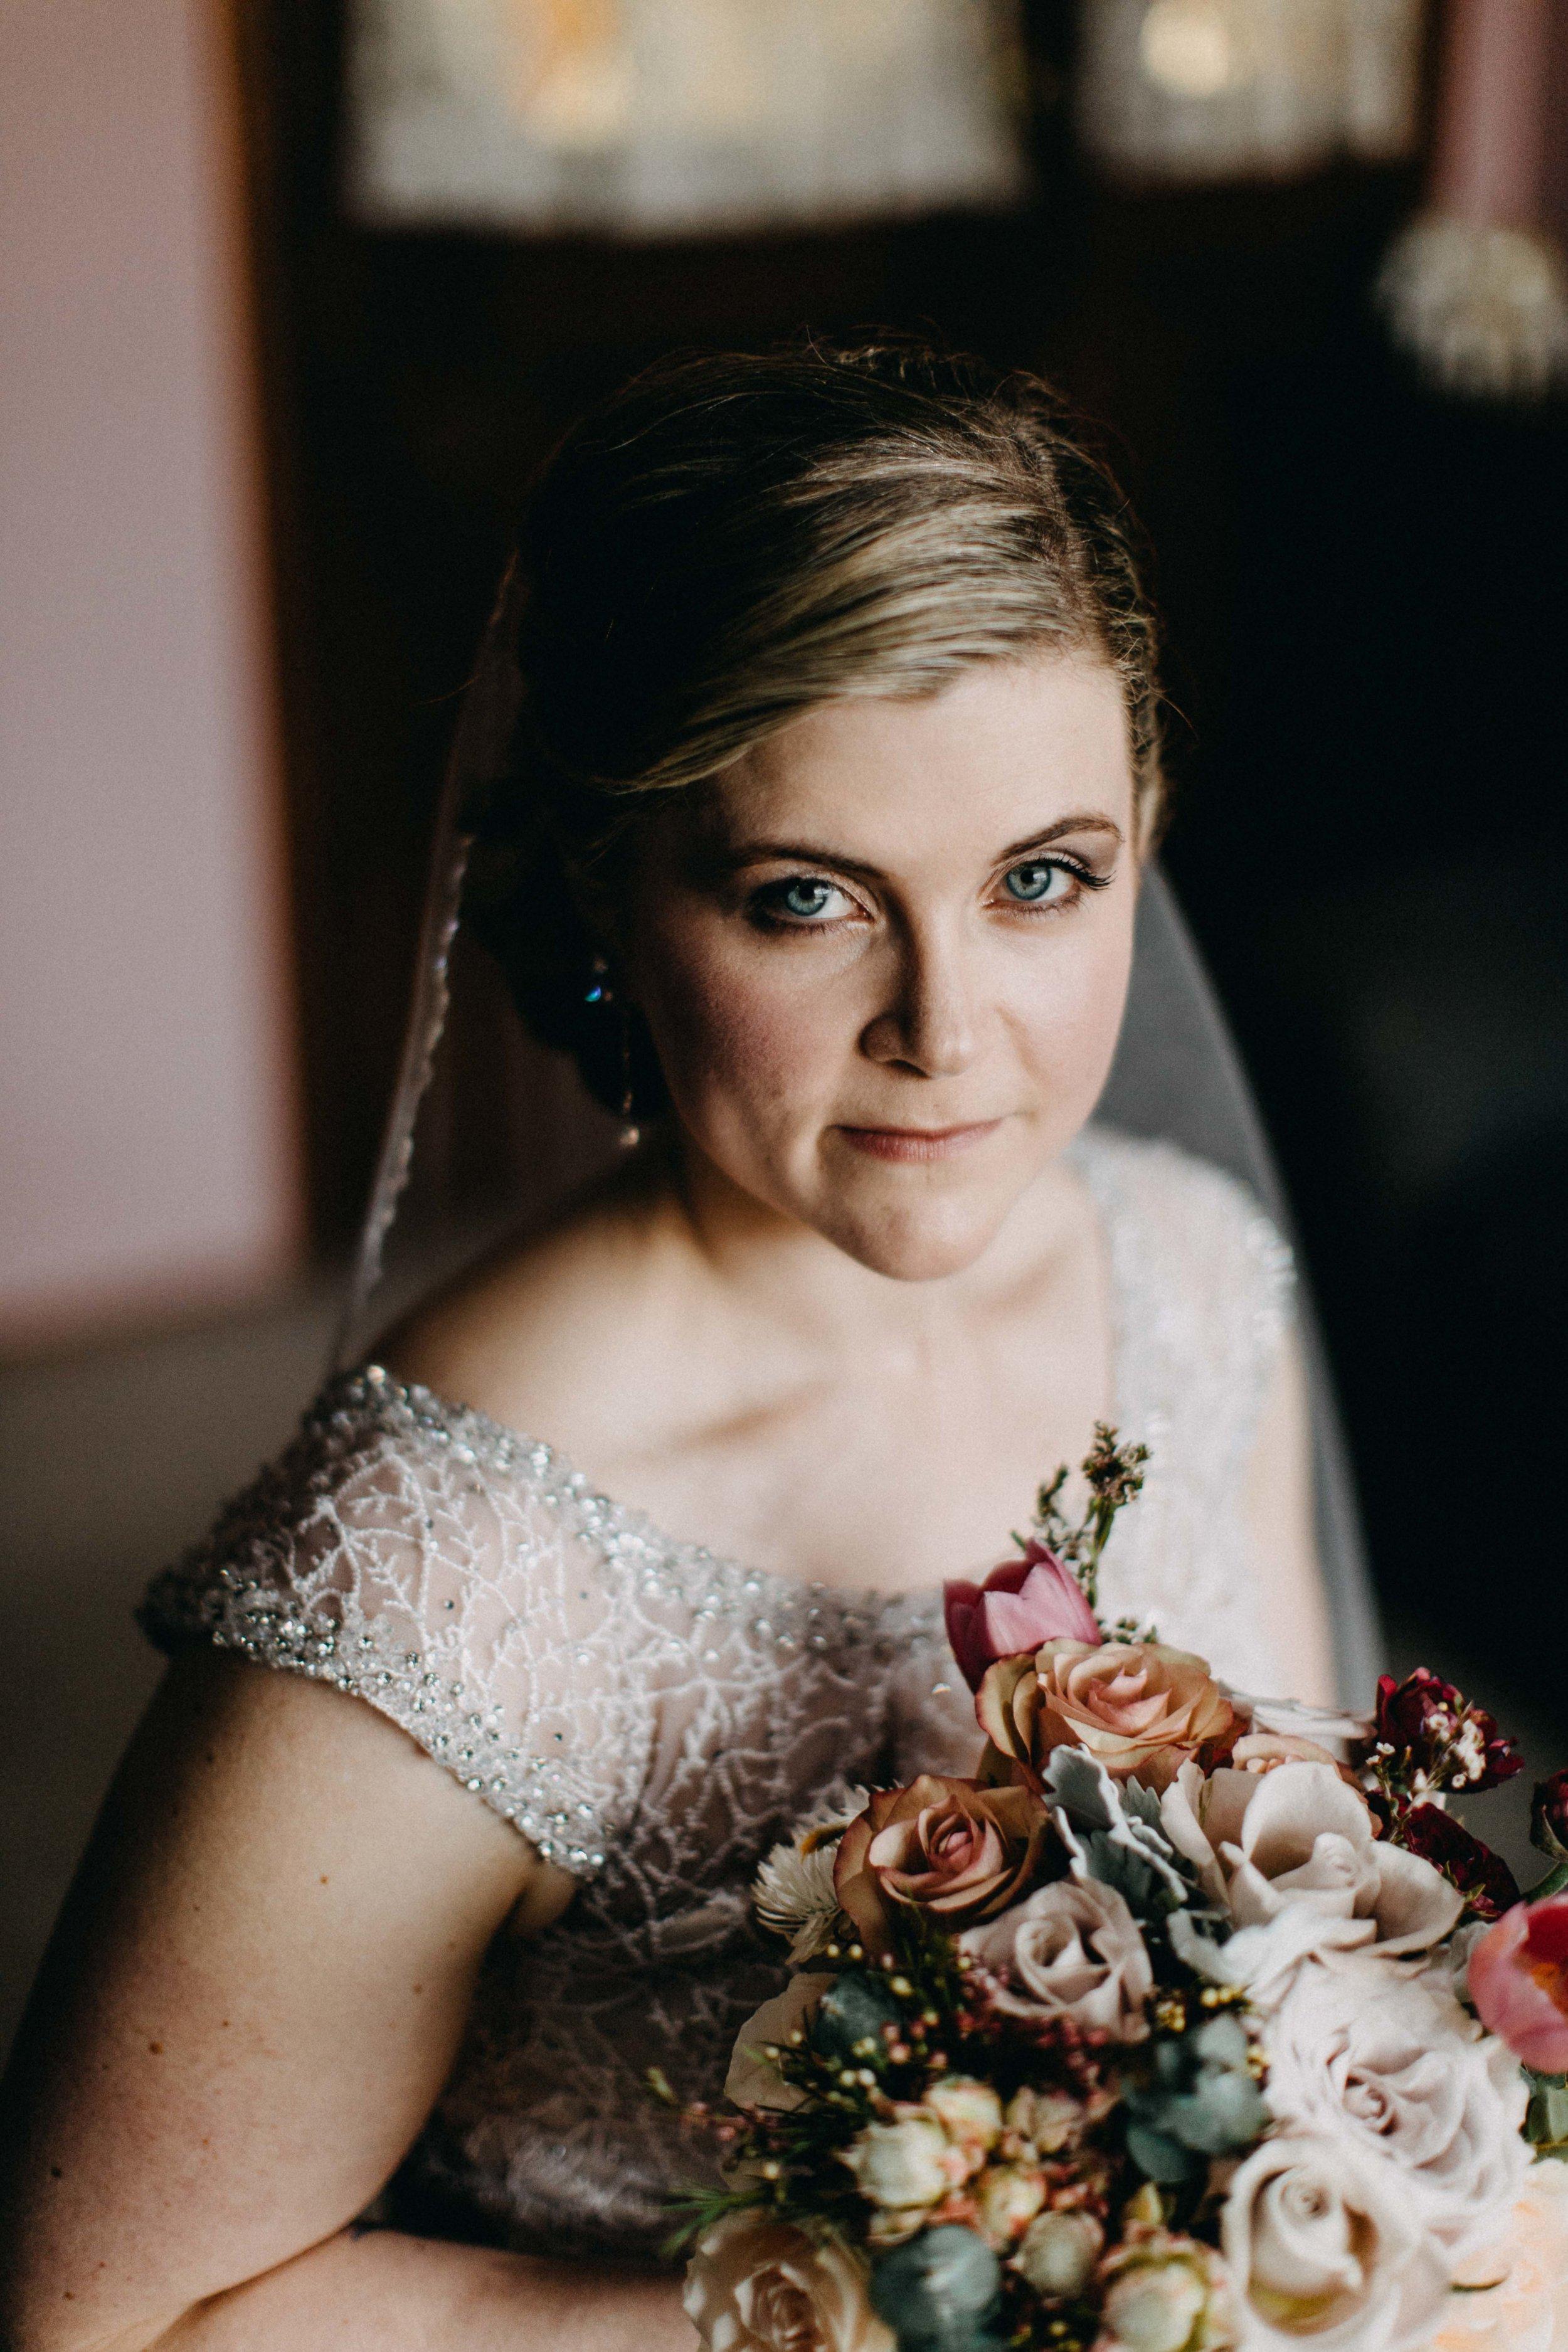 appin-house-wedding-macarthur-www.emilyobrienphotography.net-37.jpg